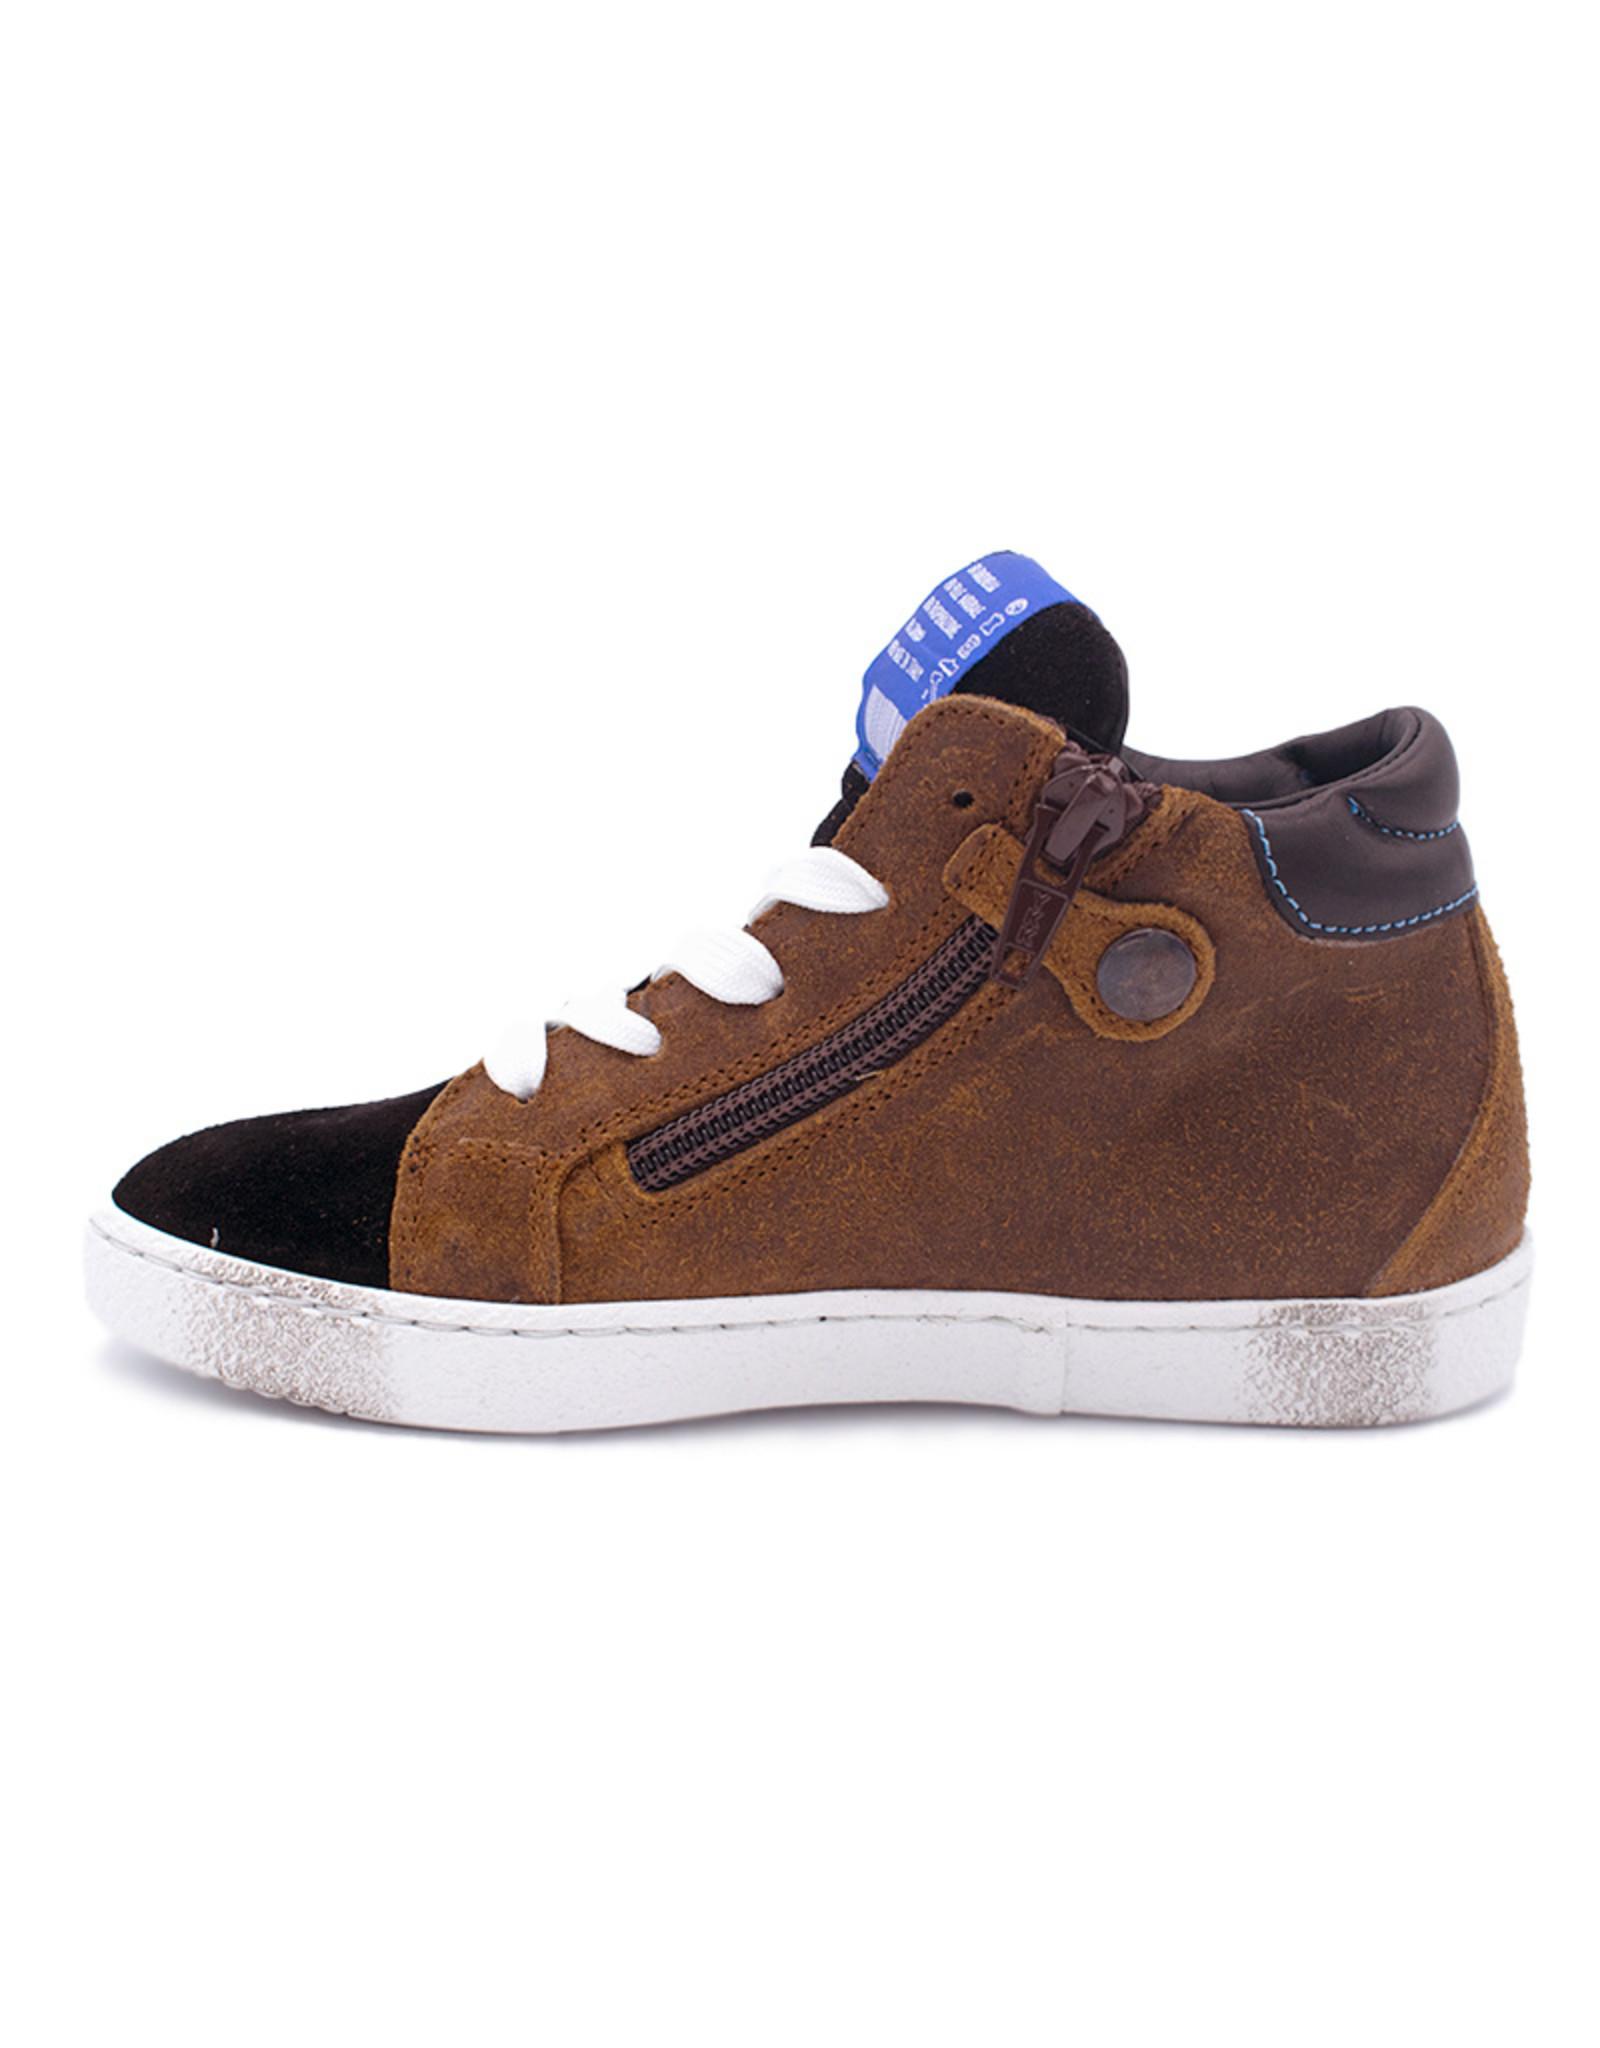 RONDINELLA RONDINELLA sneaker blauwe ster